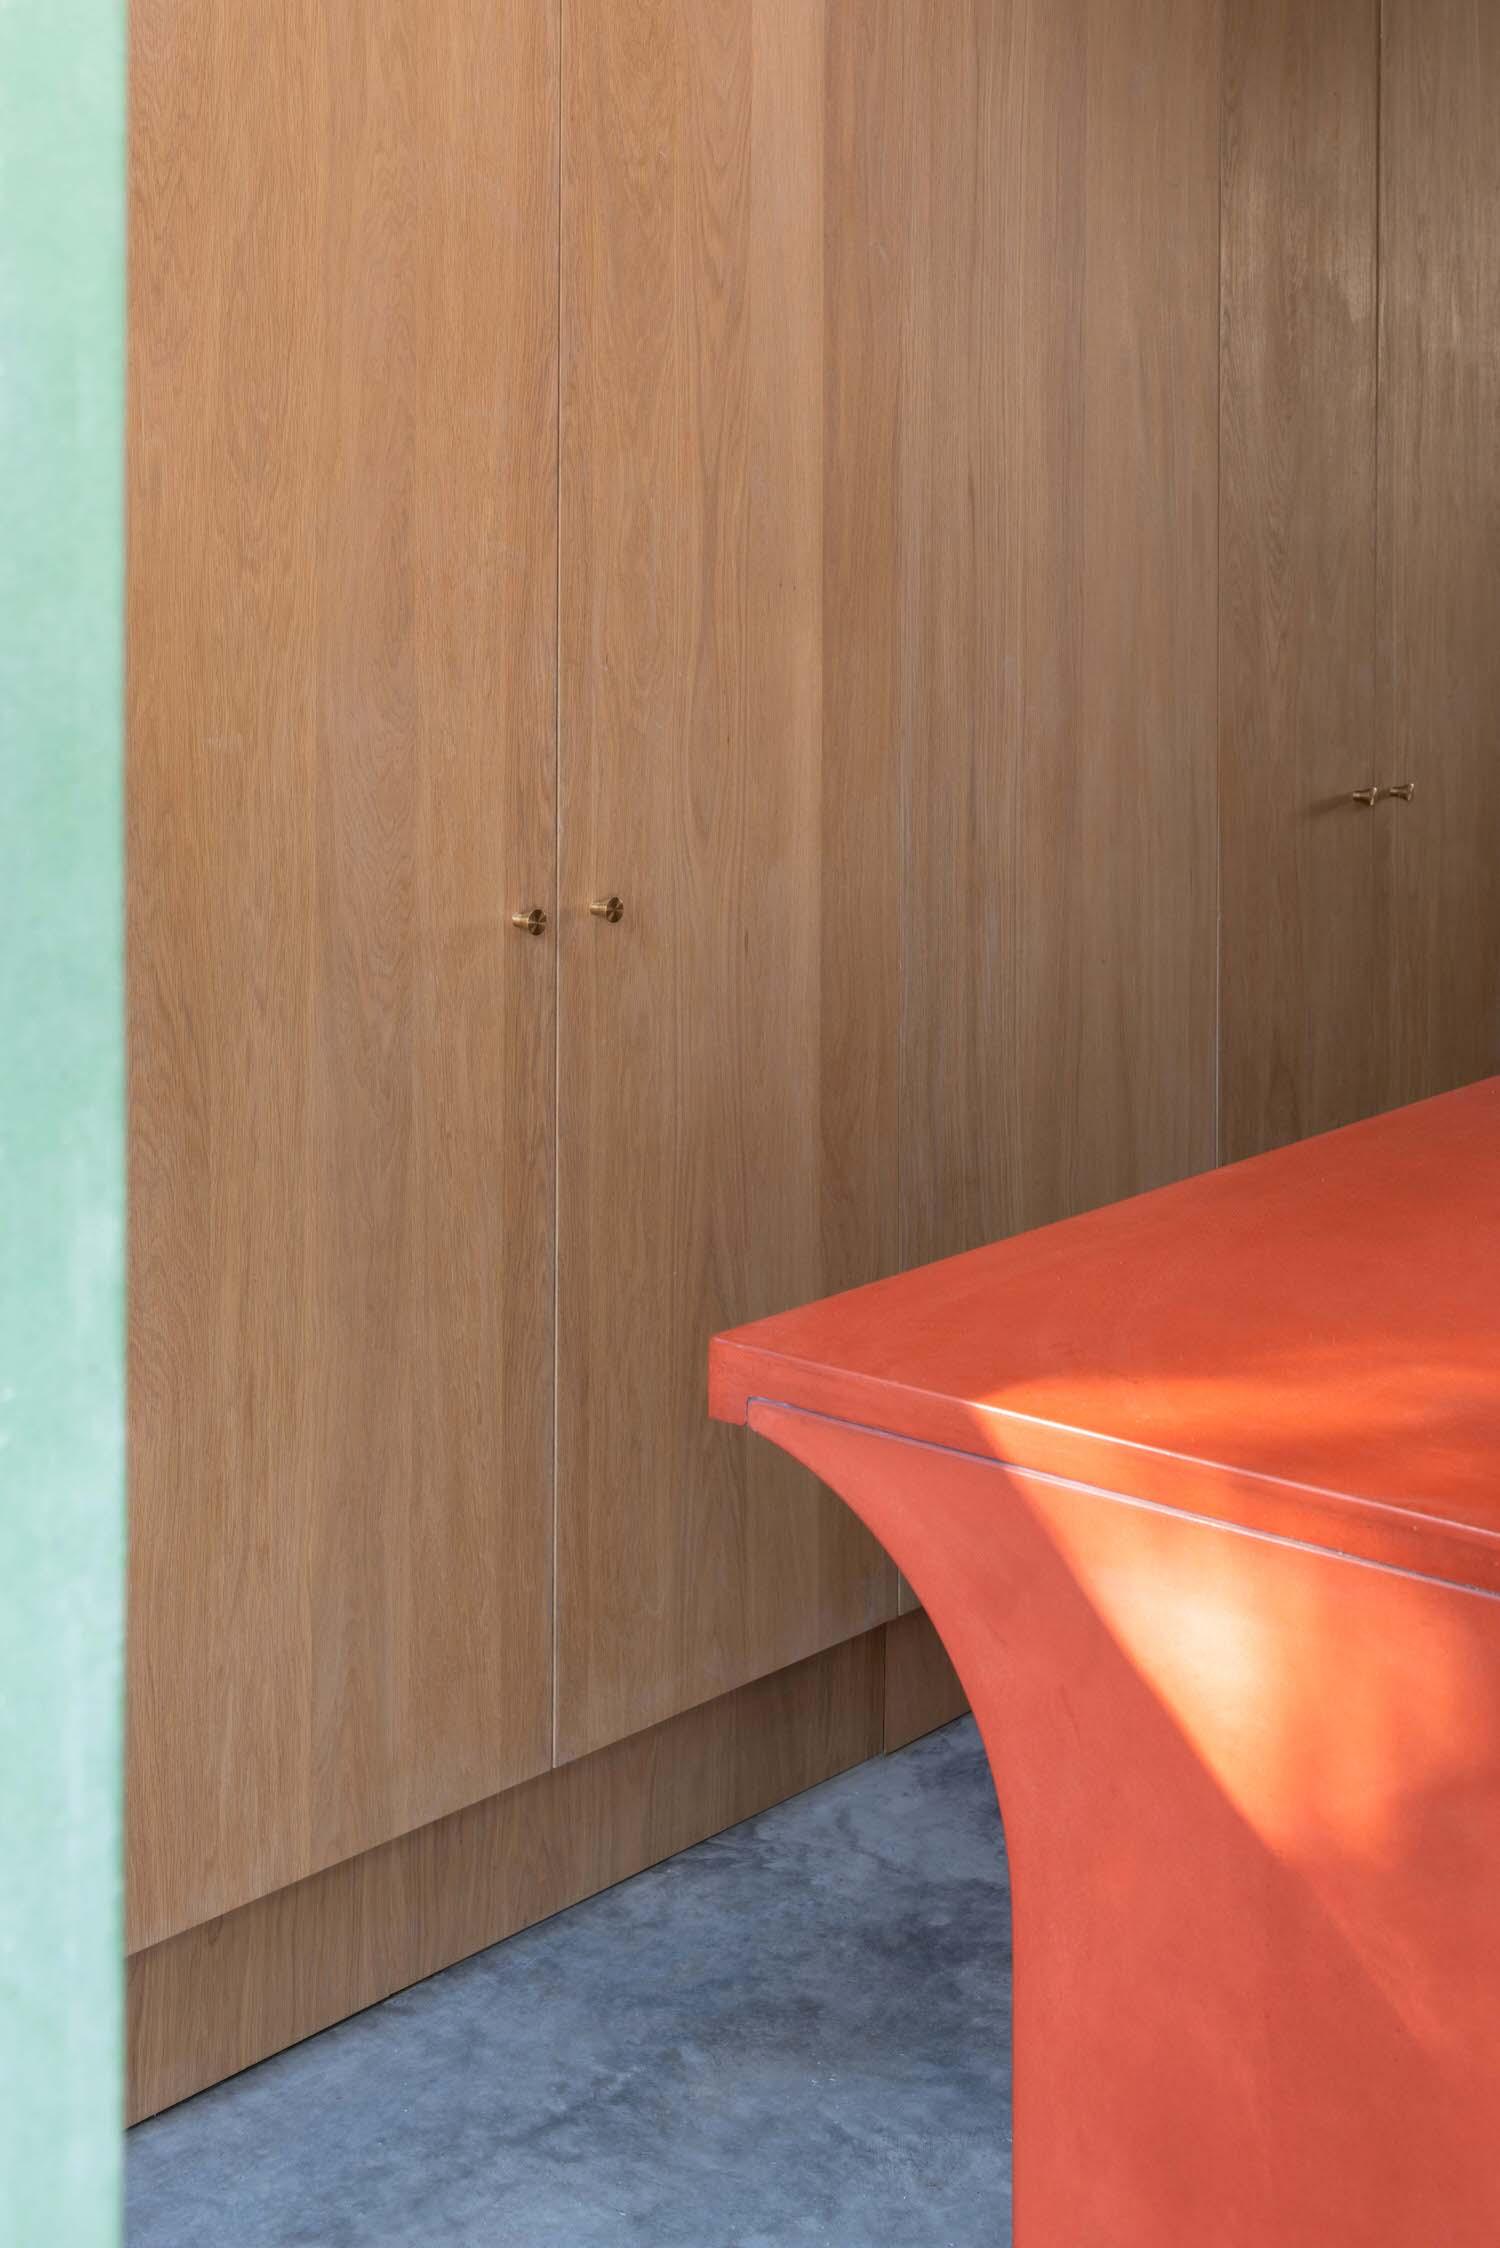 Studio Ben Allen House Recast London Residential Architecture Photo French+tye Yellowtrace 08